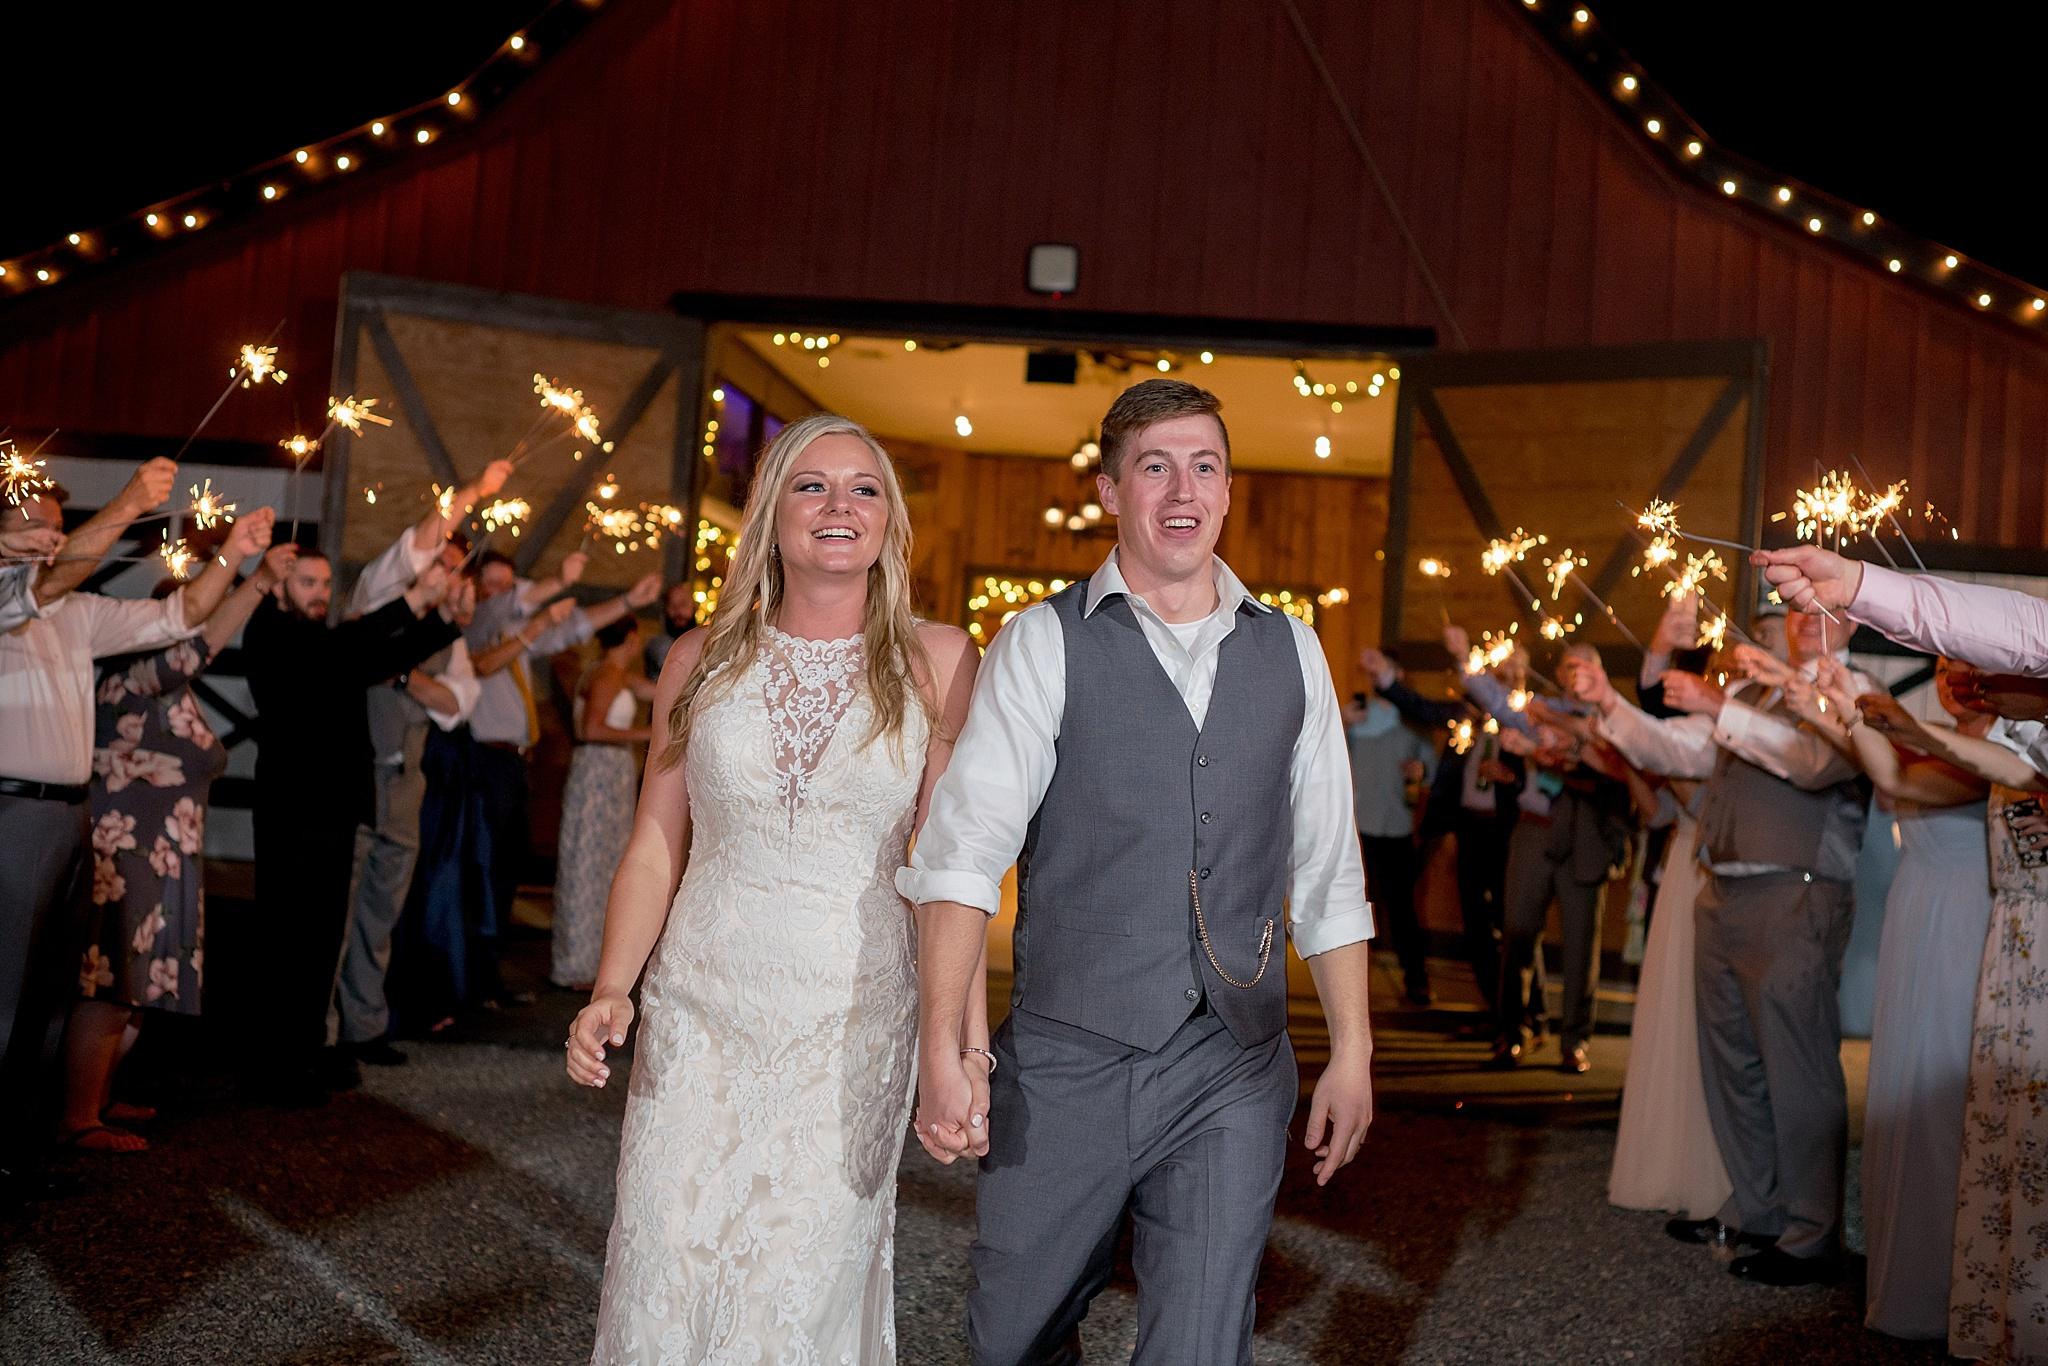 Shady-Wagon-Farm-NC-Wedding-Photographer-0204.jpg